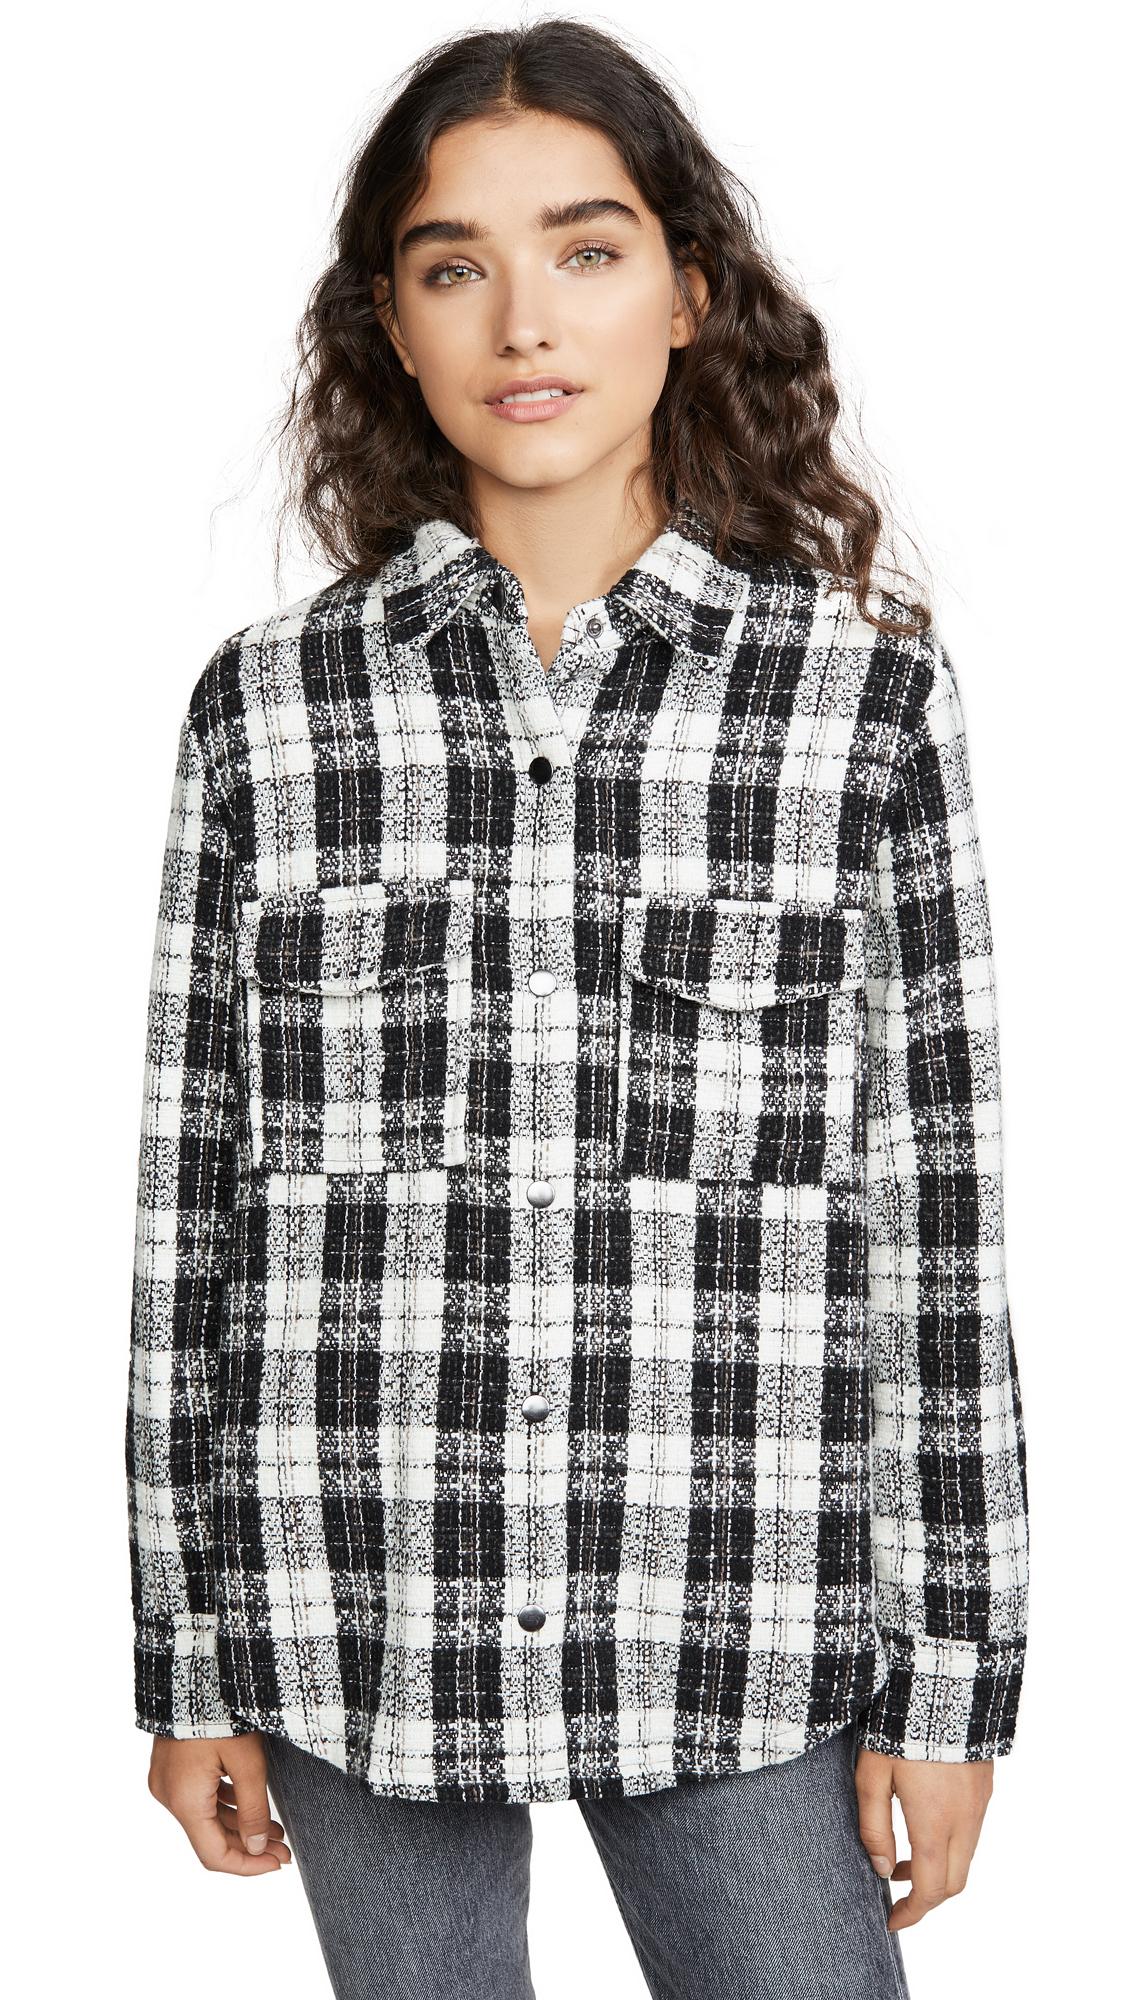 BB Dakota Checkmate Jacket - Black